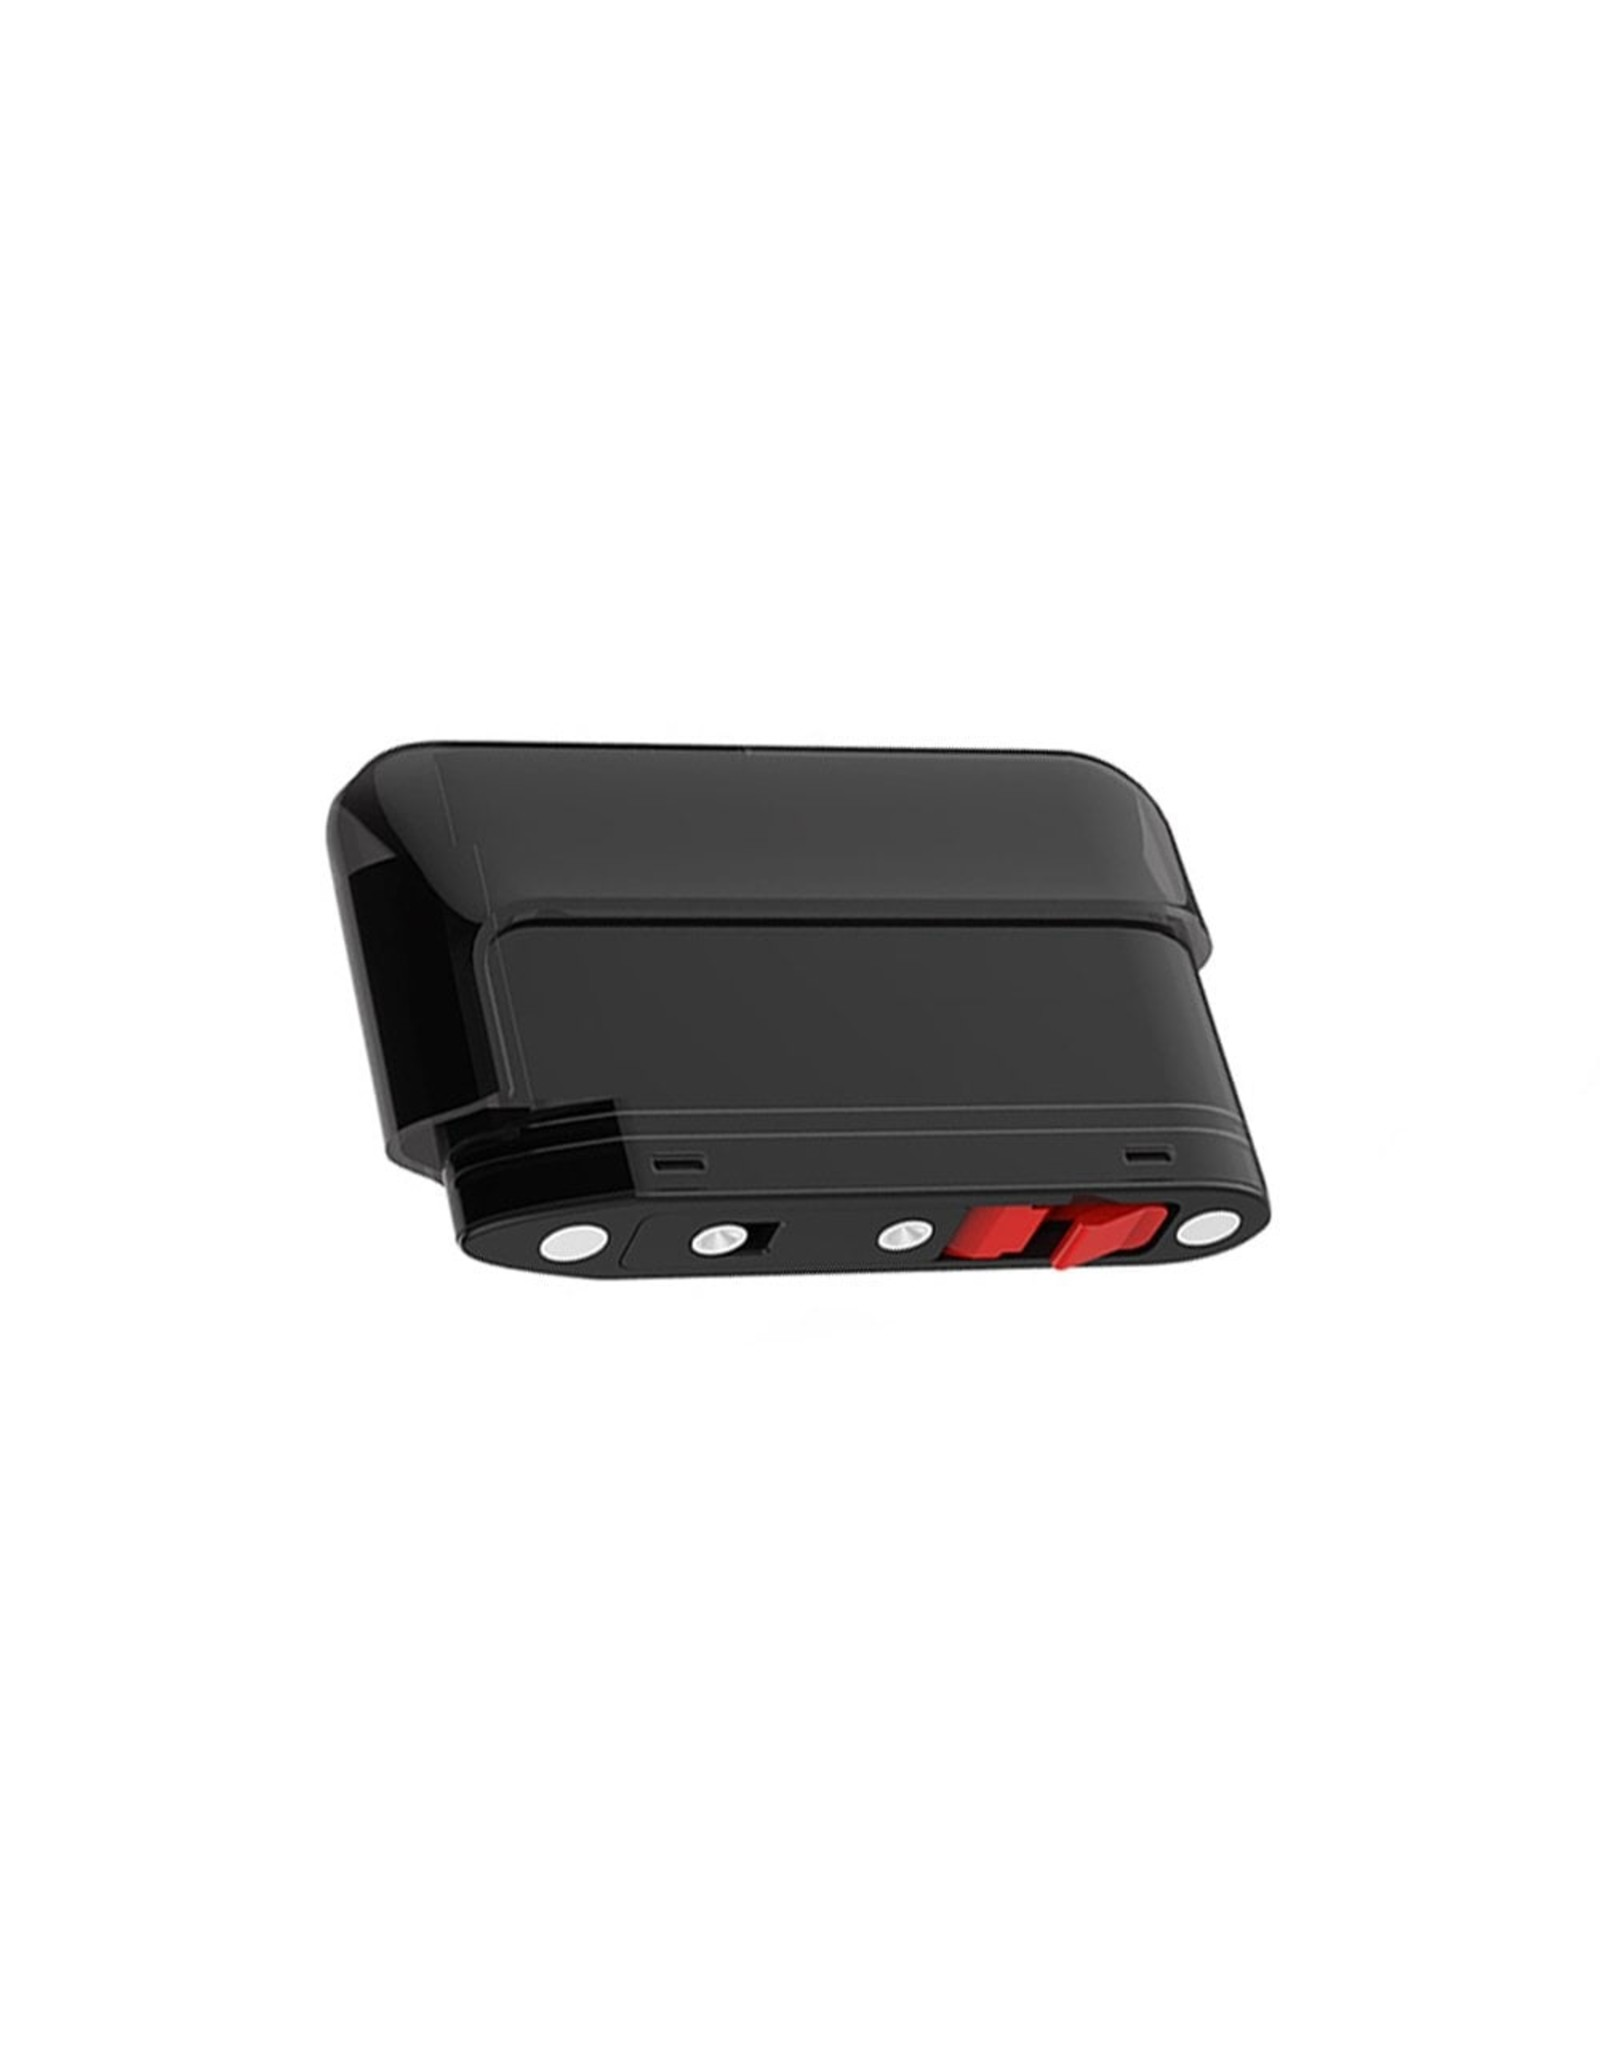 Suorin Air Plus Replacement Cartridge